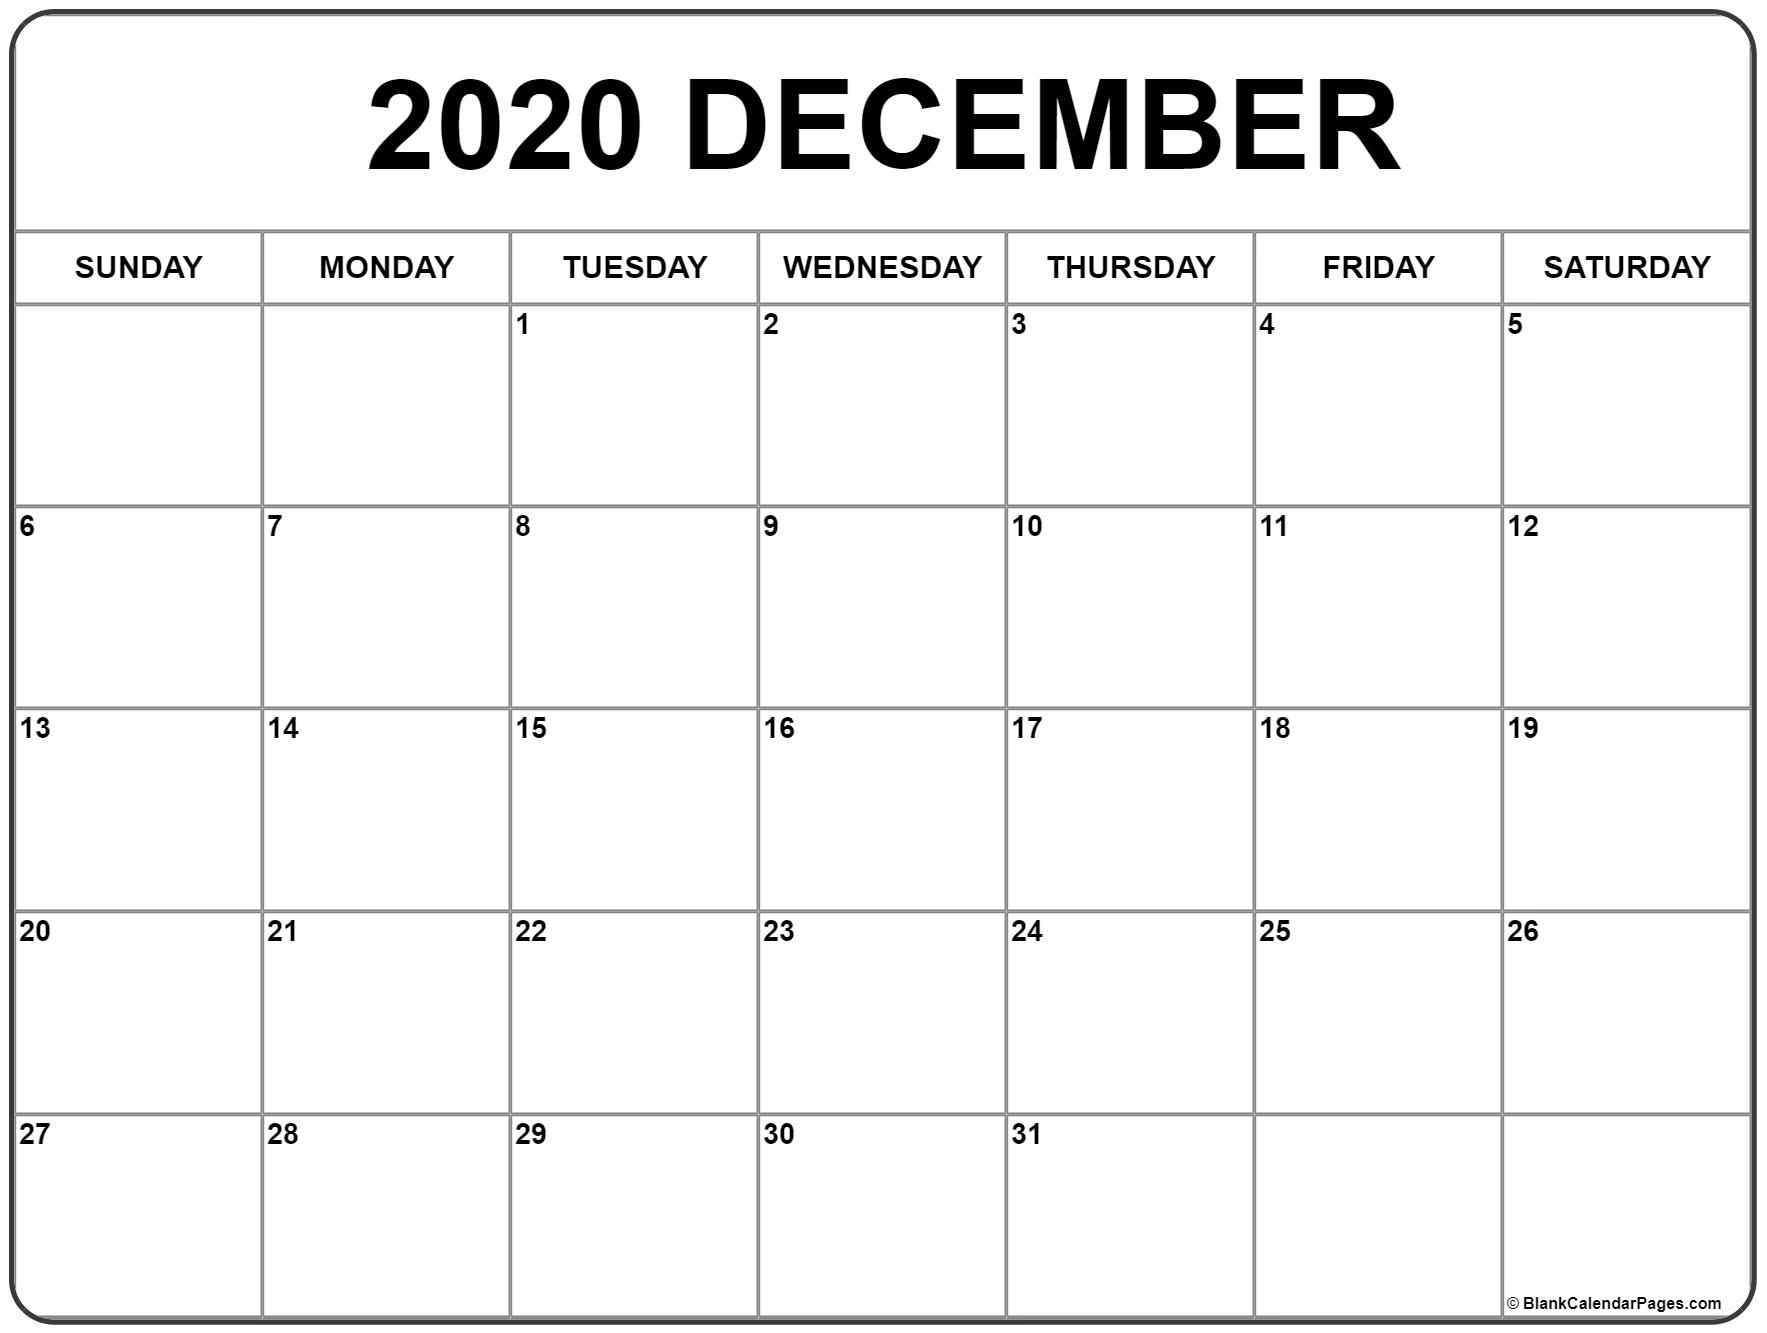 December 2020 Calendar | Free Printable Monthly Calendars for 30 Day Blank Calendar For Bills Due